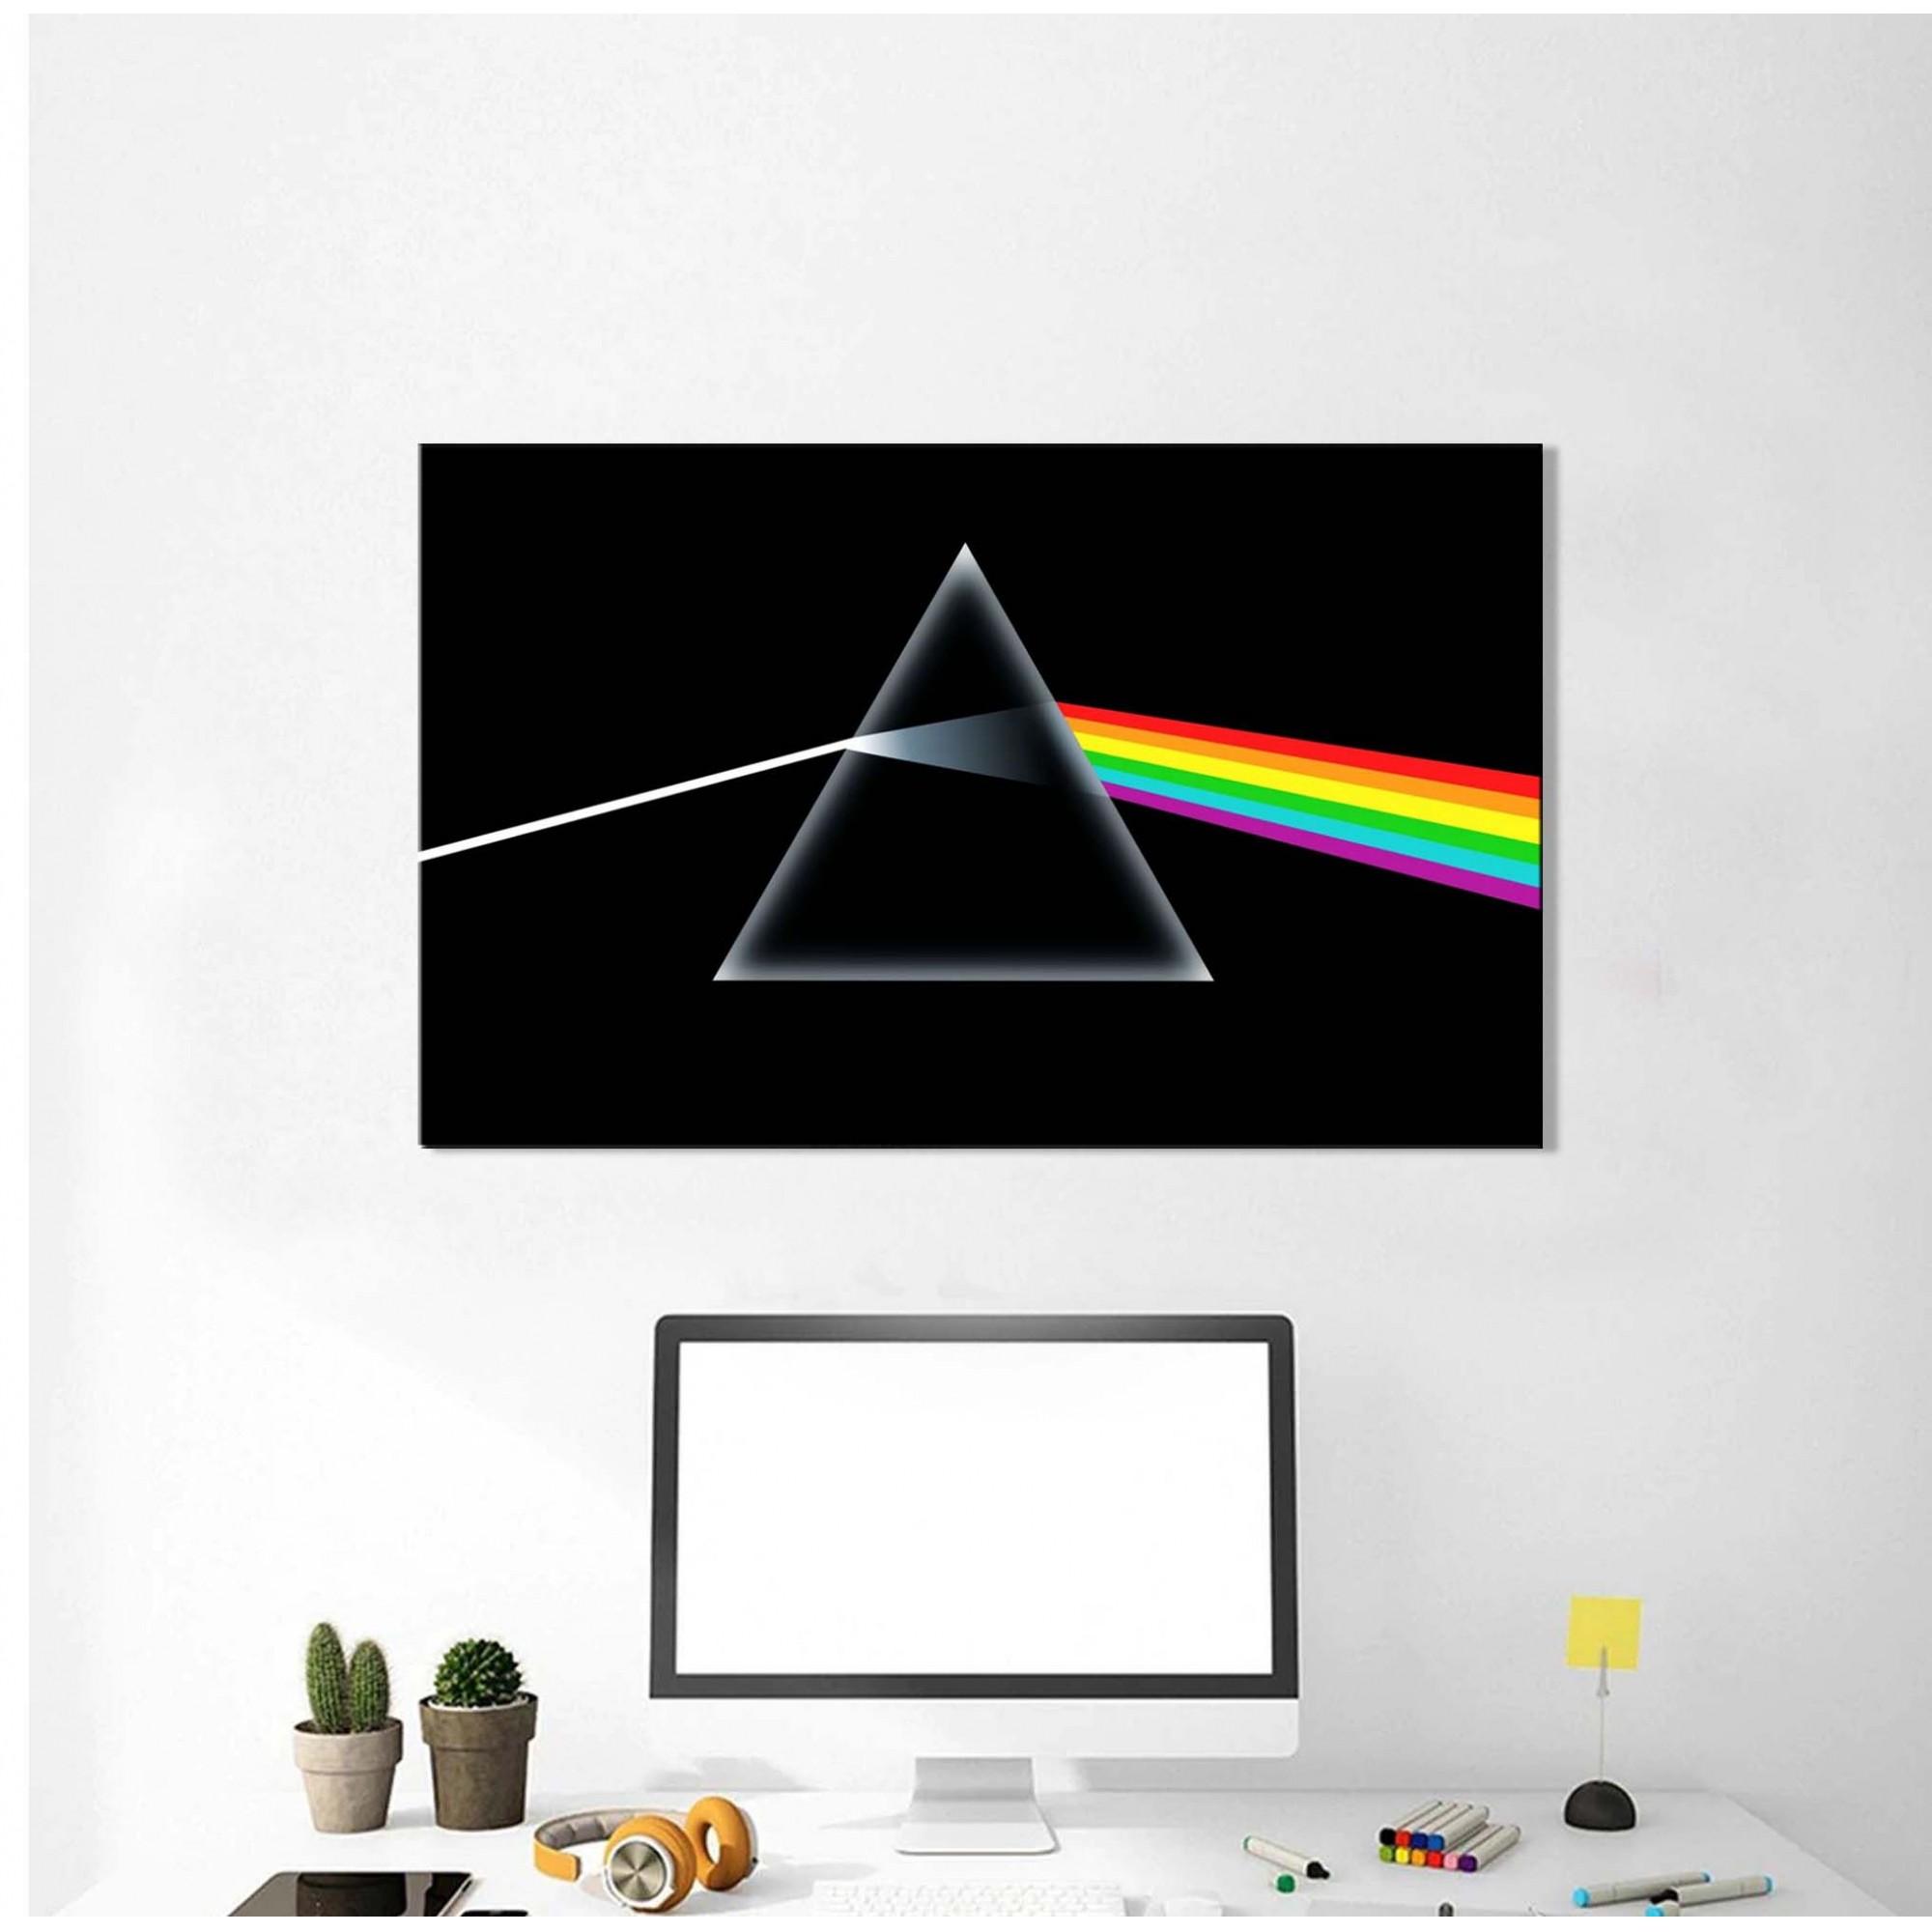 Quadro Decorativo Banda Pink Floyd 1 Peça